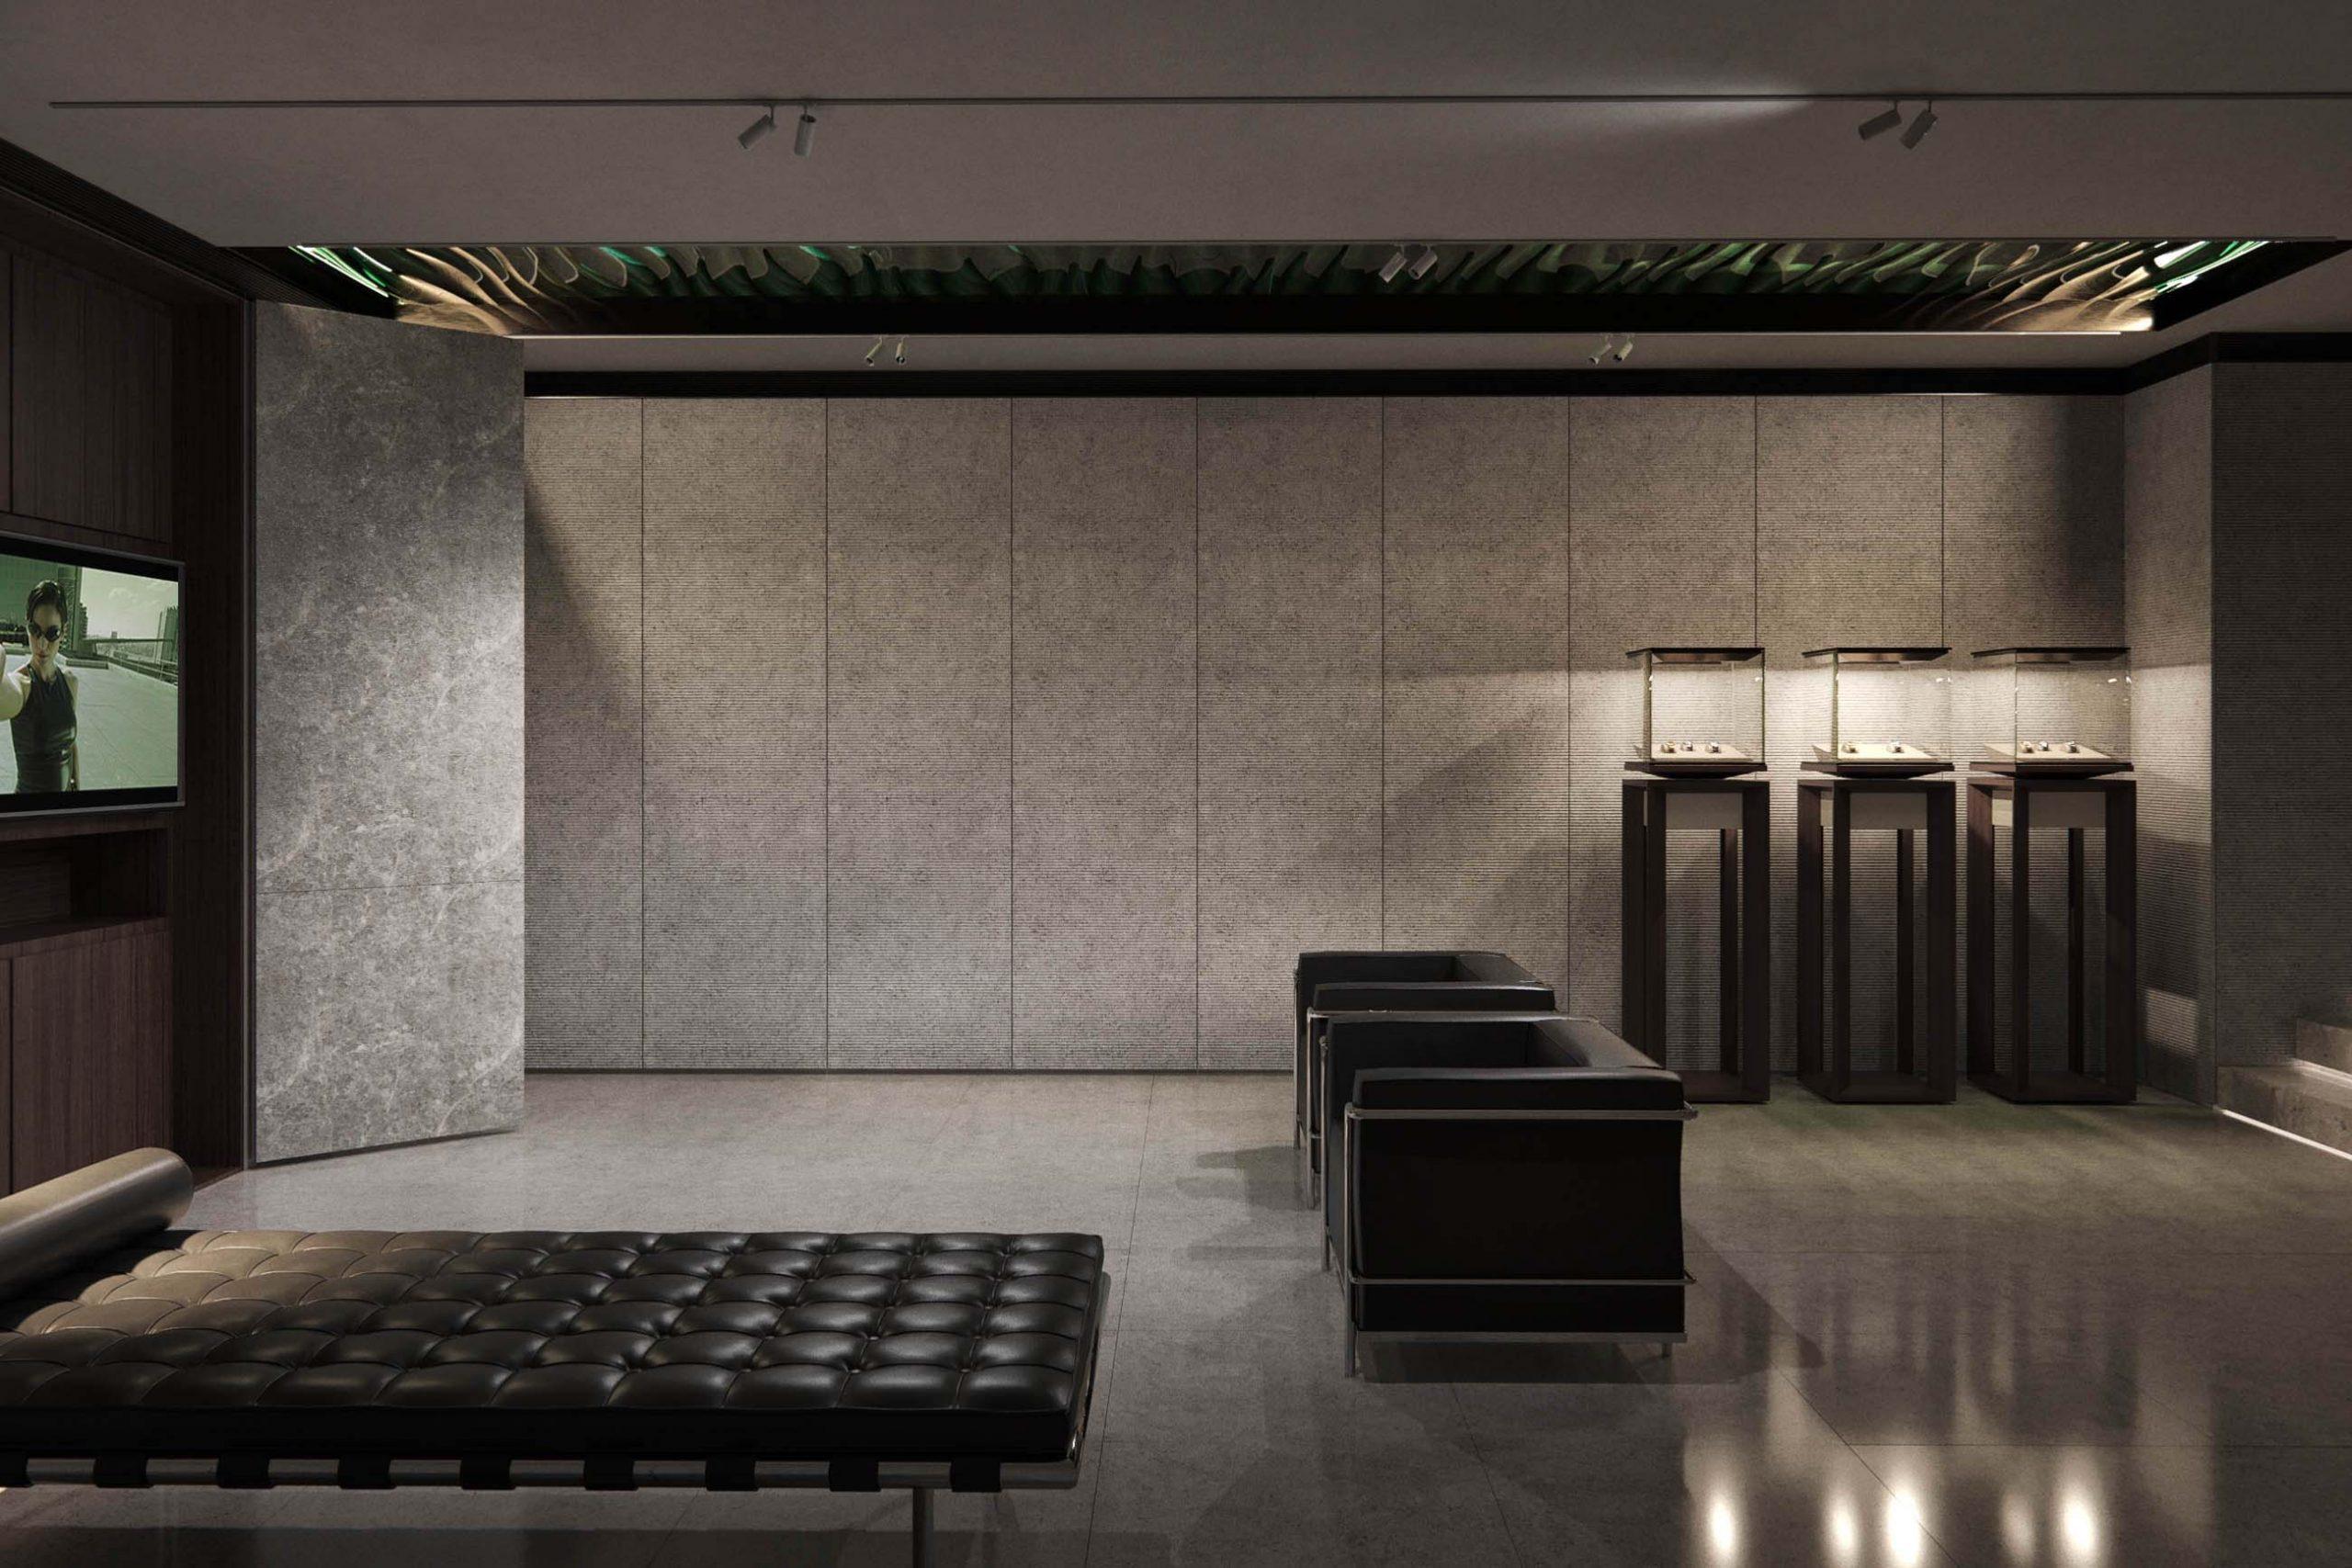 https://dprostudio.com/wp-content/uploads/2020/11/Lounge1-scaled.jpg